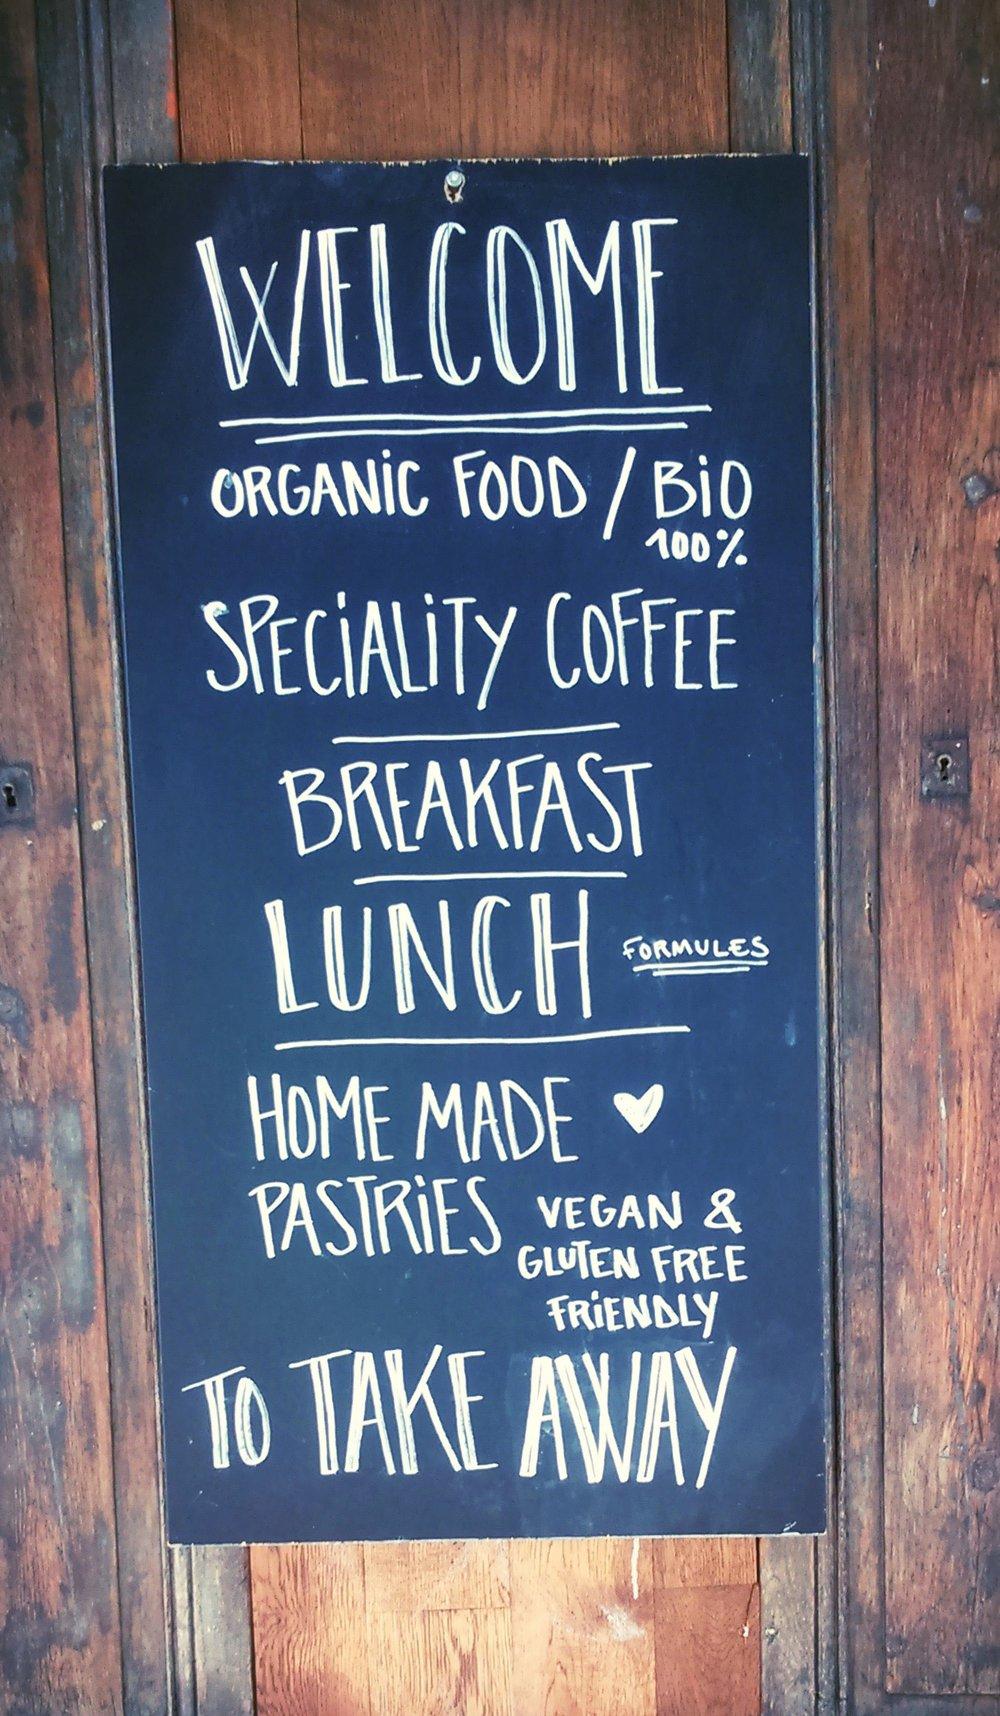 menu-bio-vegan-veggie-cookmegreen.jpg